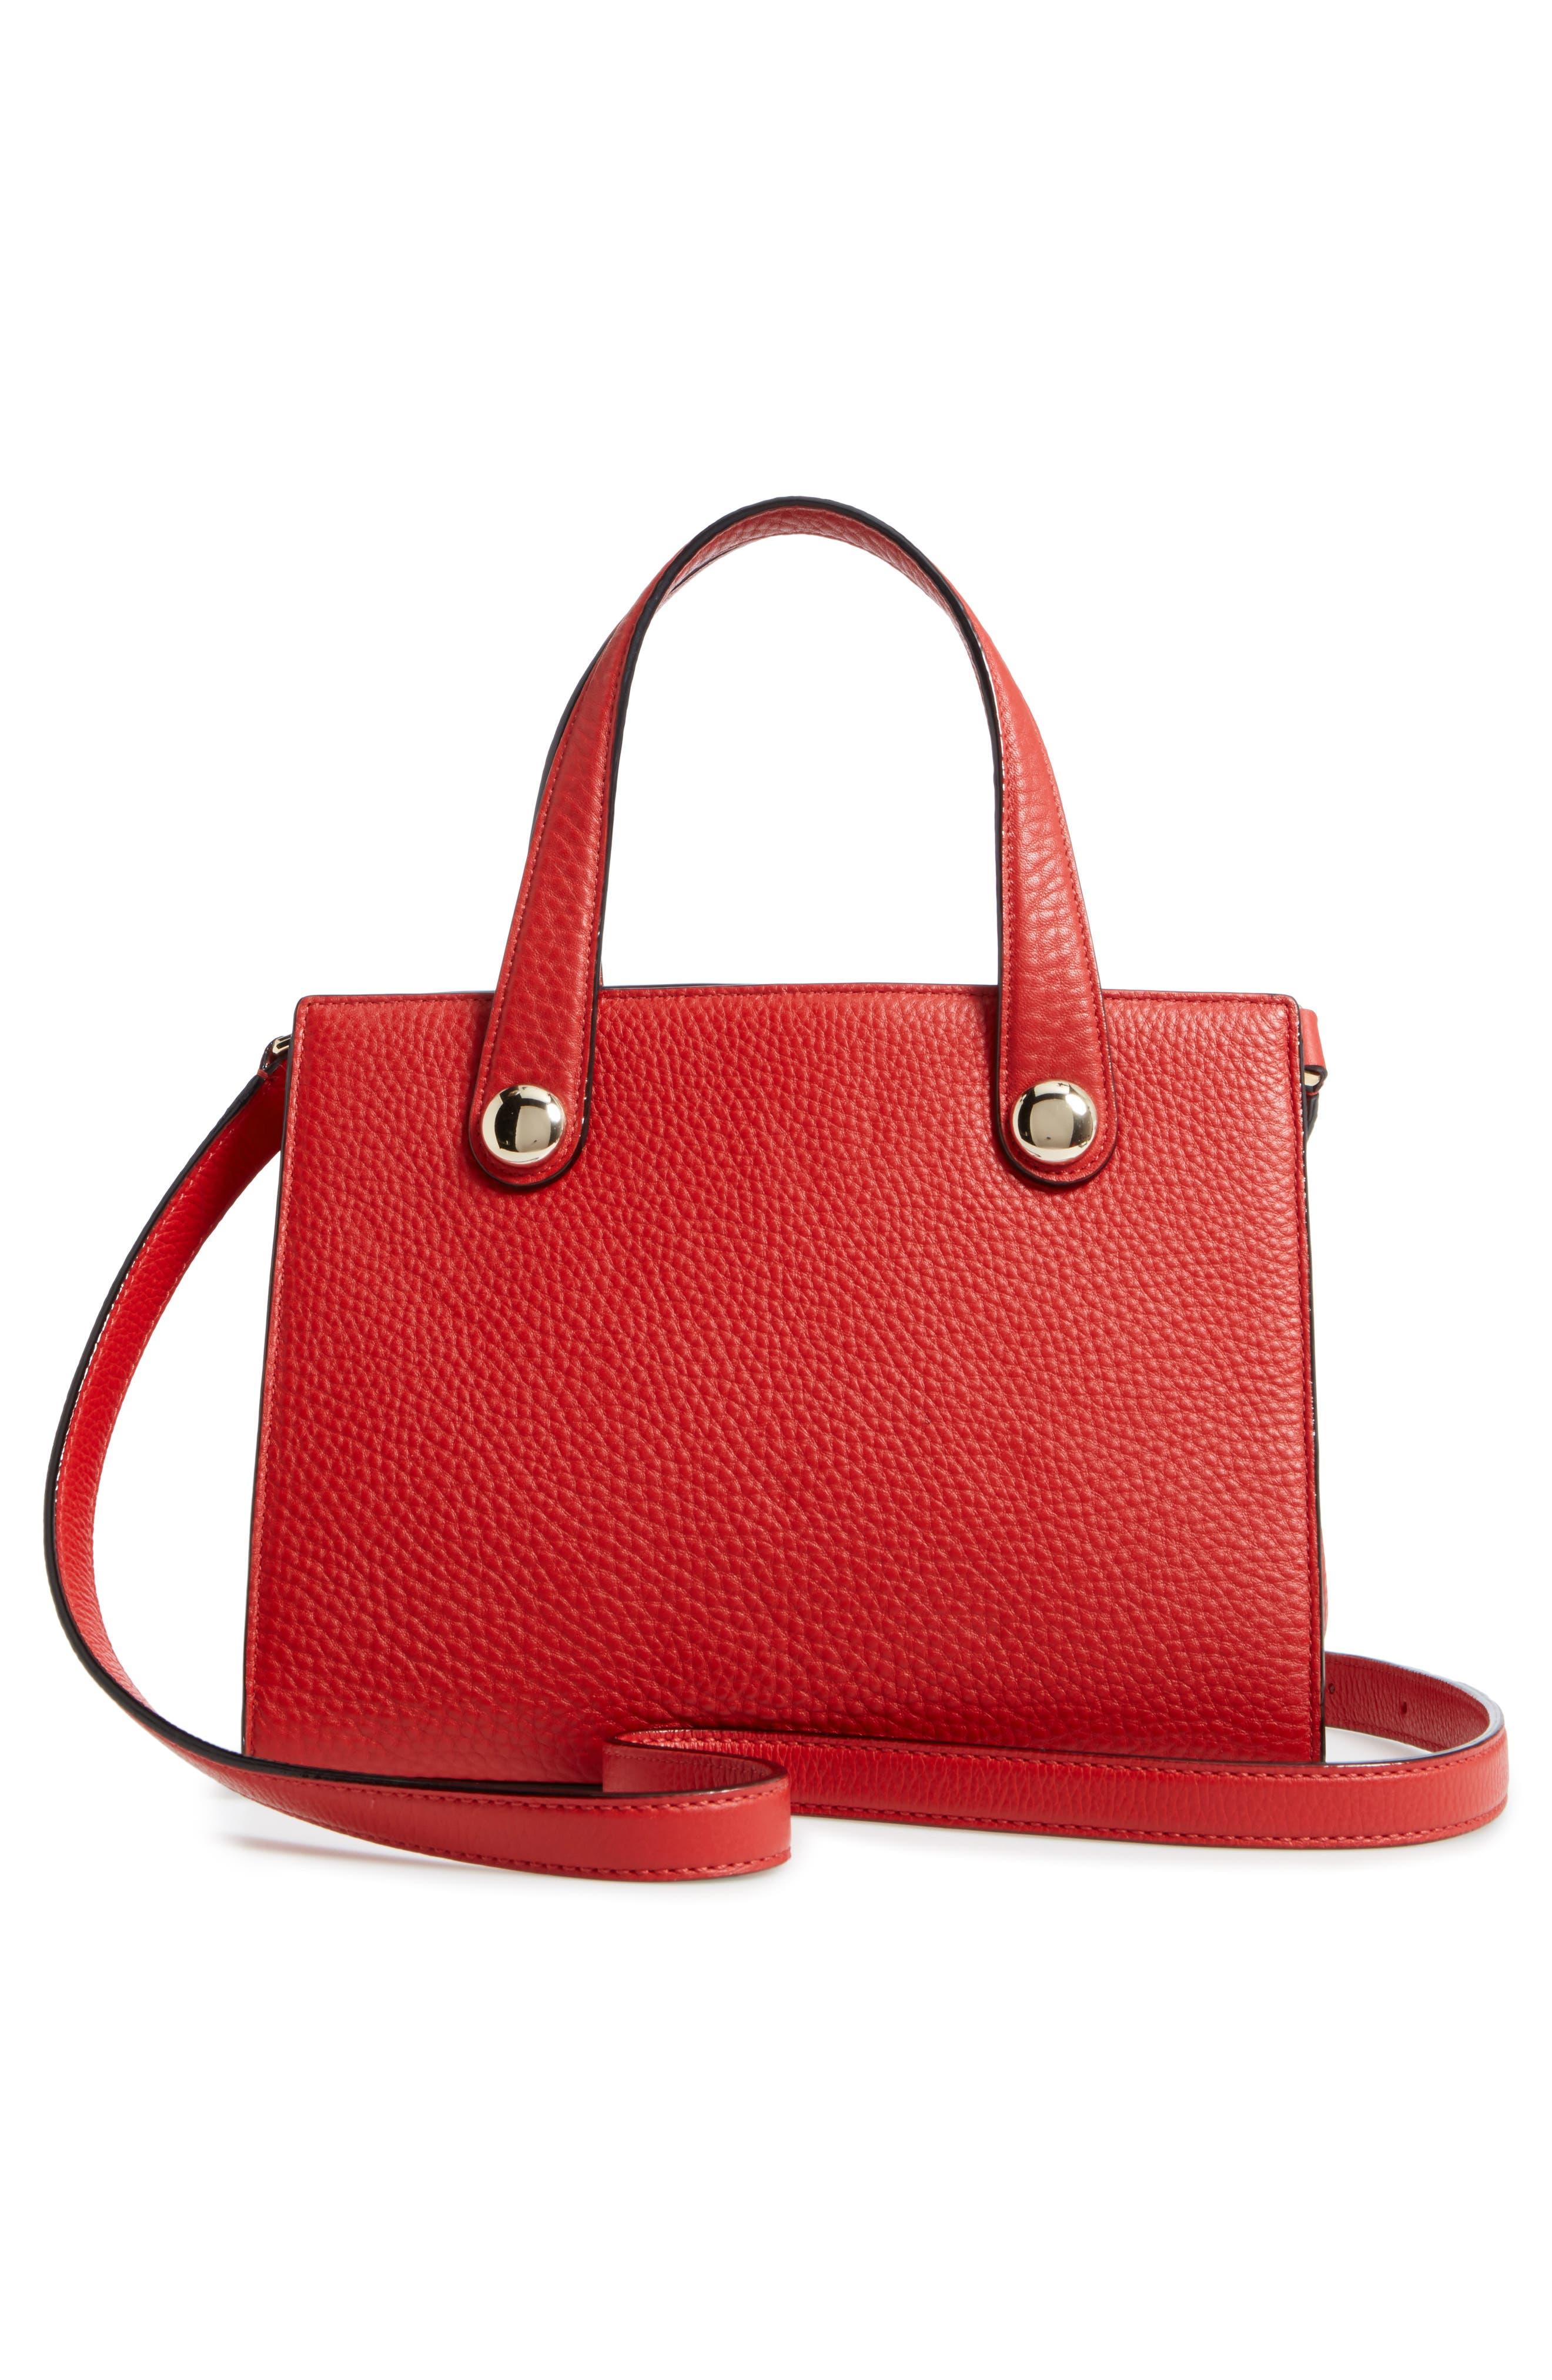 stewart street - little joy leather satchel,                             Alternate thumbnail 2, color,                             631